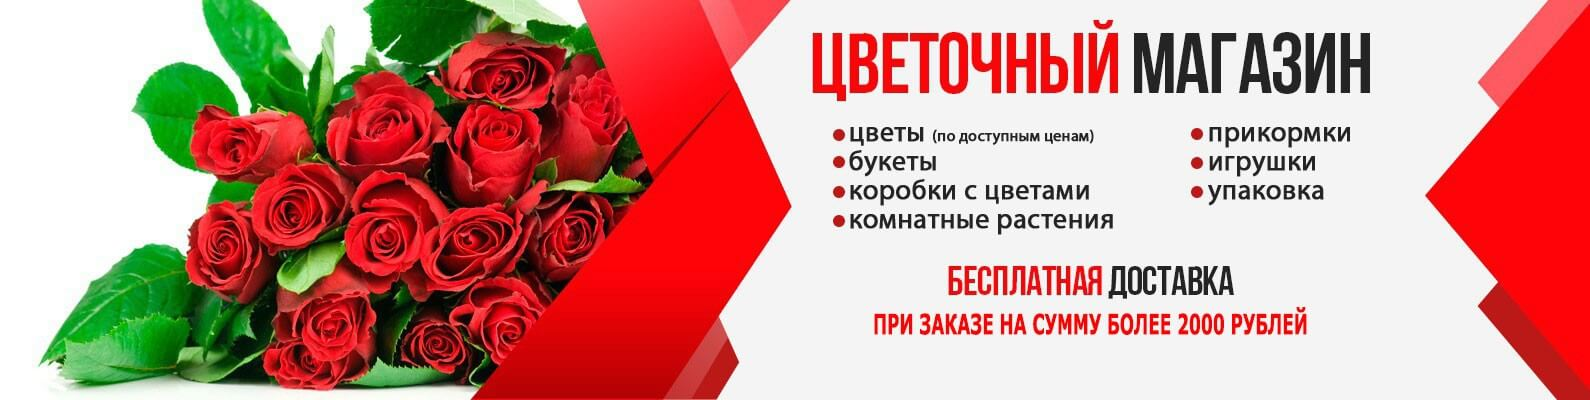 Камелия-Бесплатная доставка на дом букетов при заказе на сумму от 2000 рублей